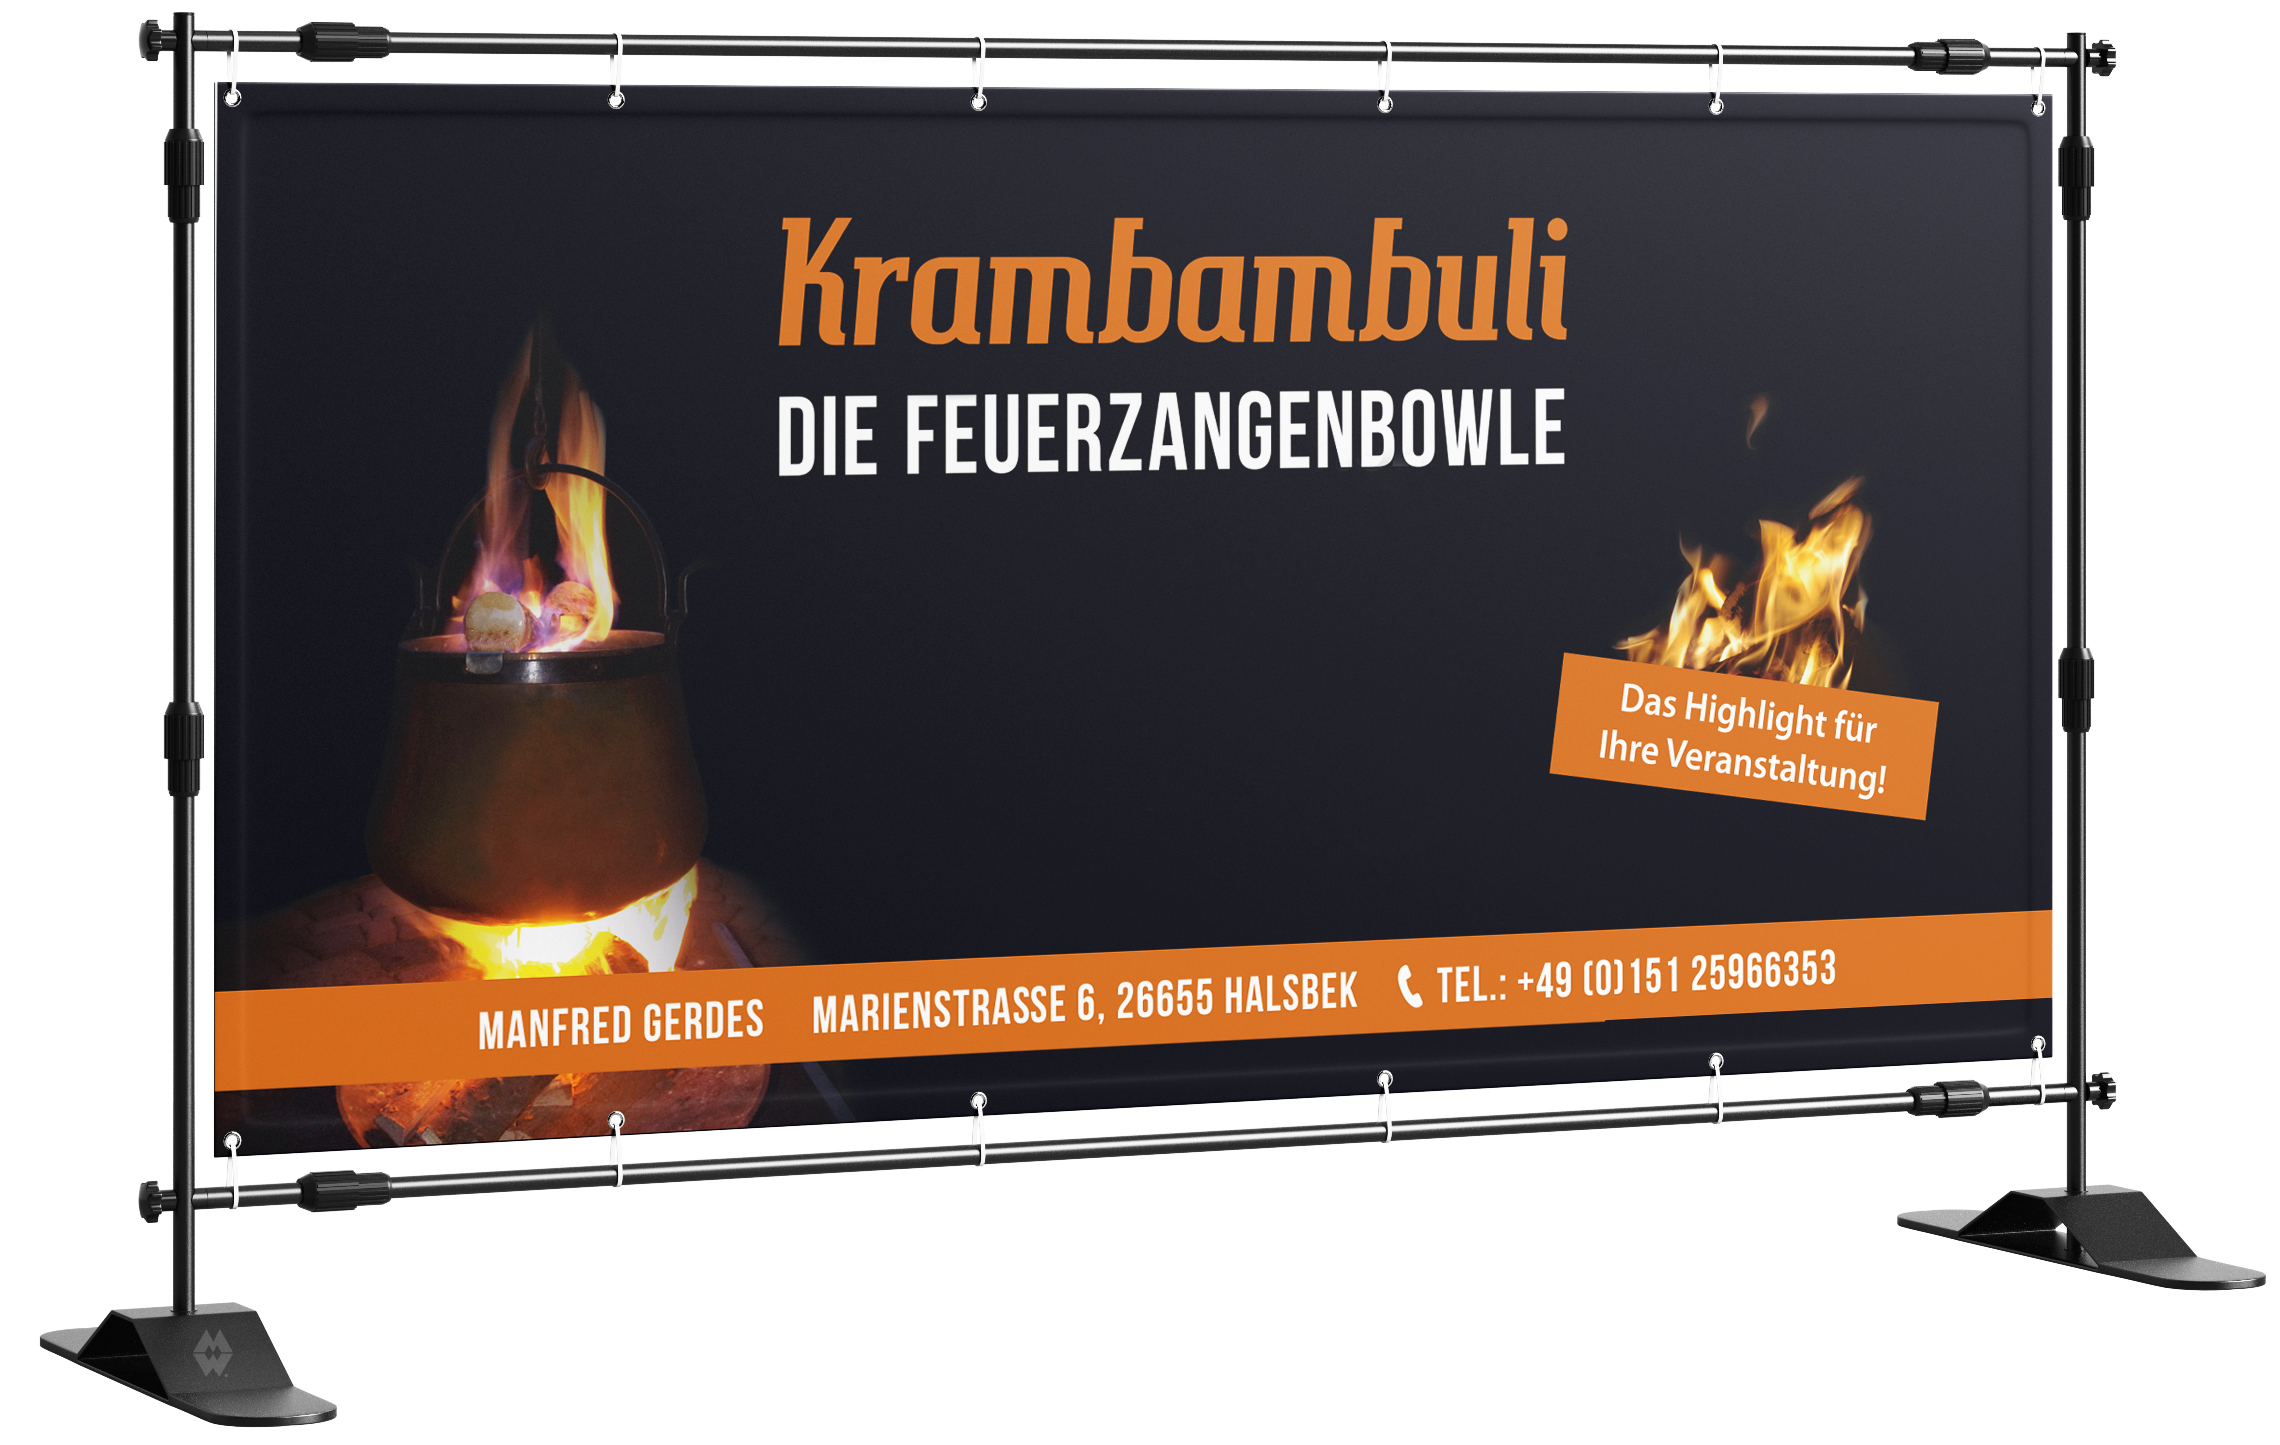 krambambuli-feuerzangenbowle-mesh-plane